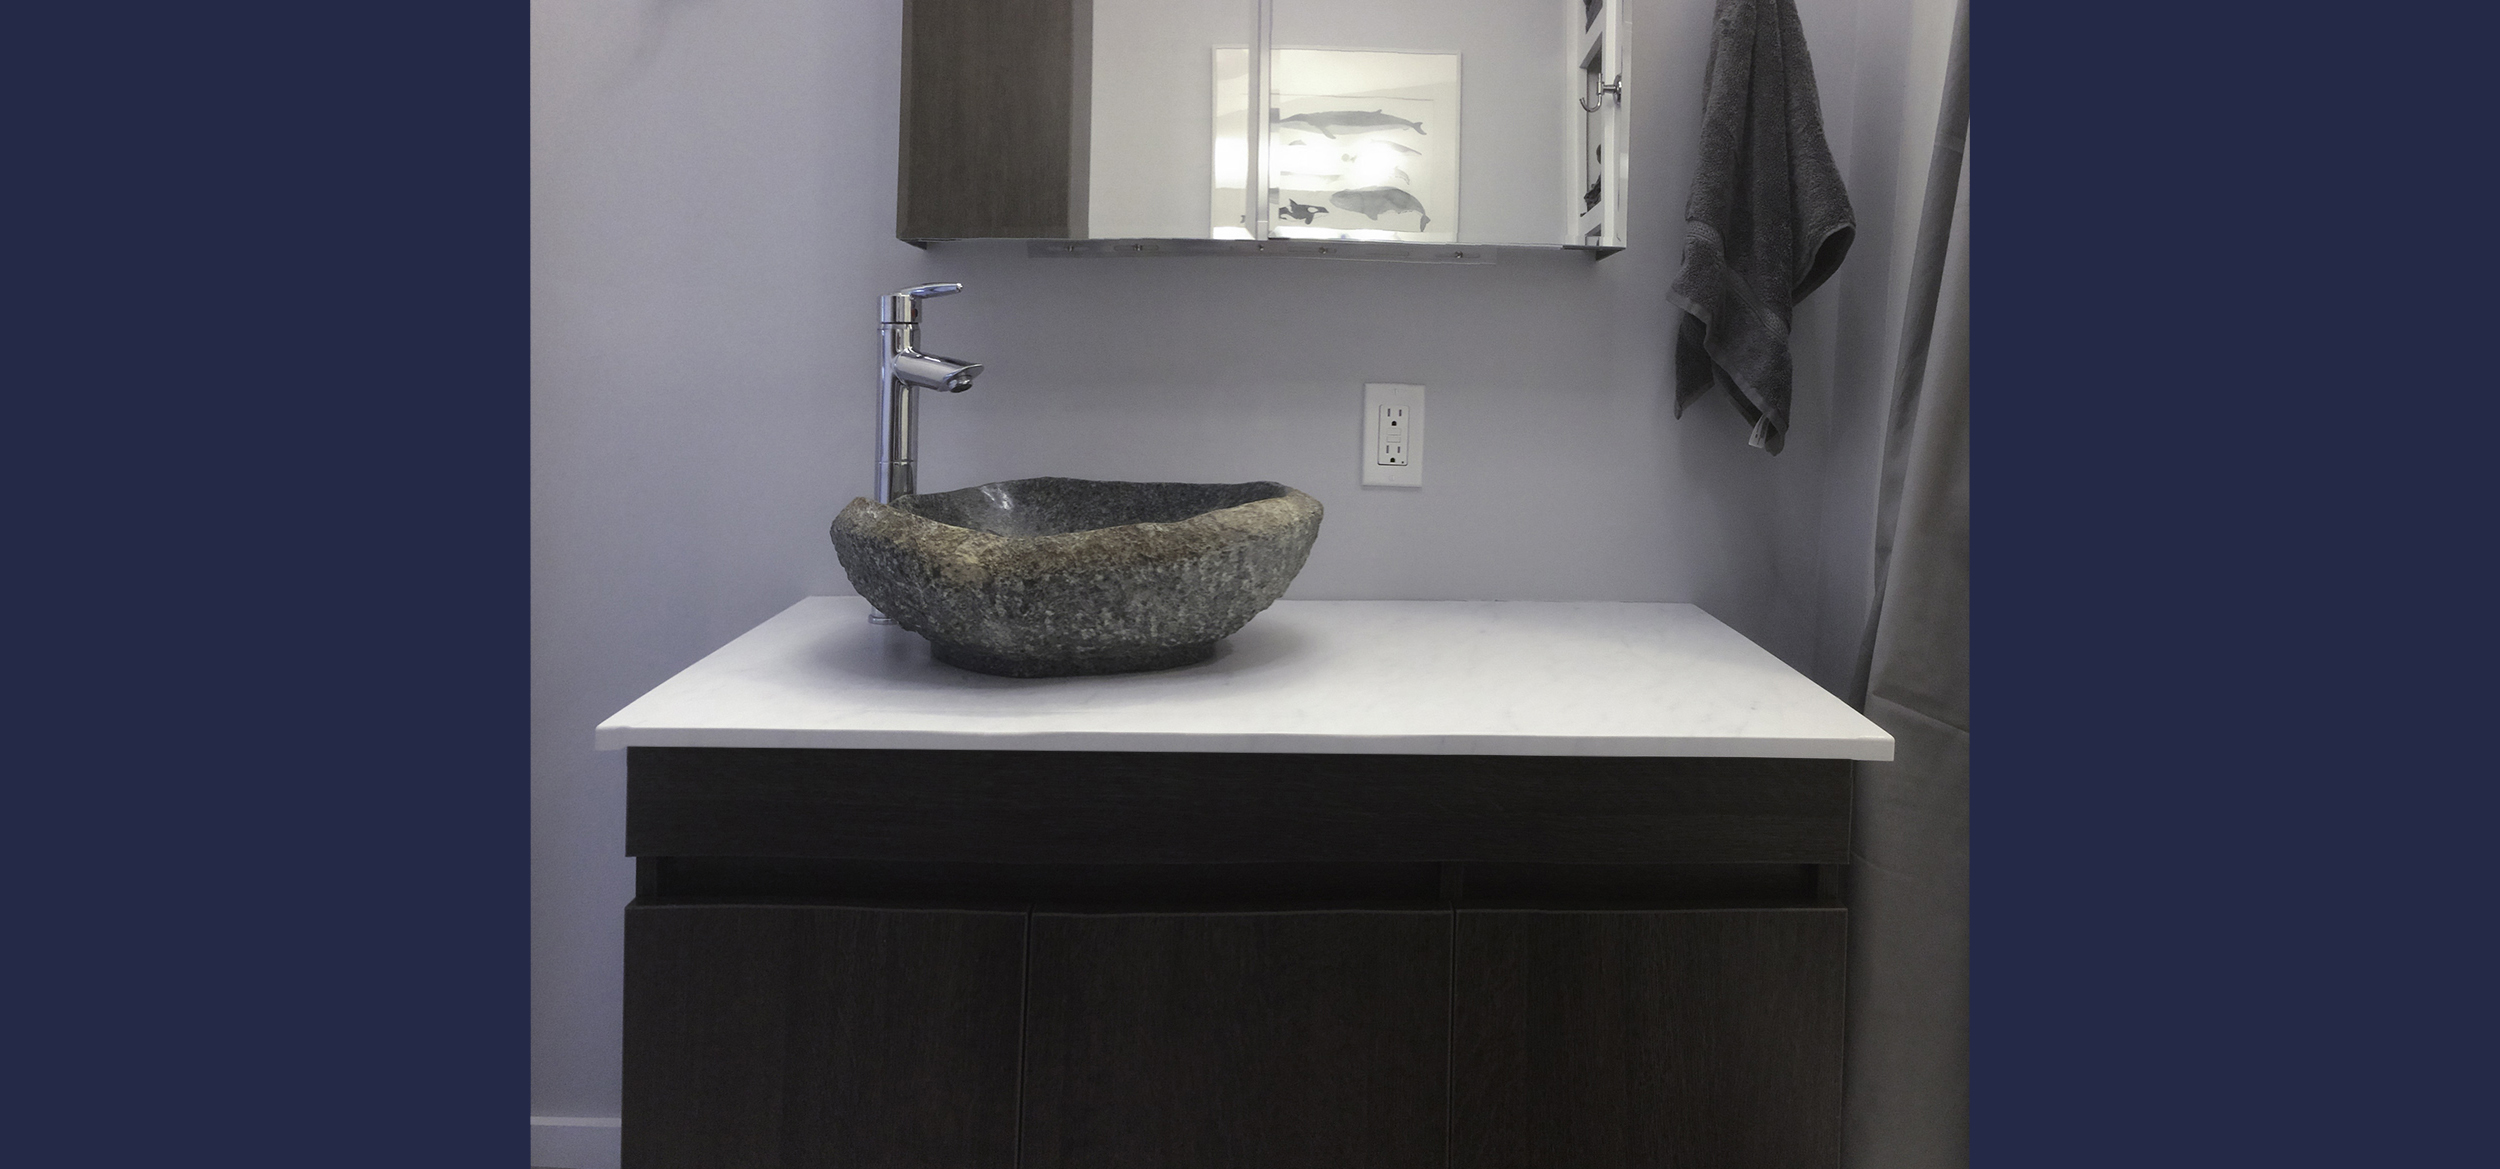 Sink copy.jpg